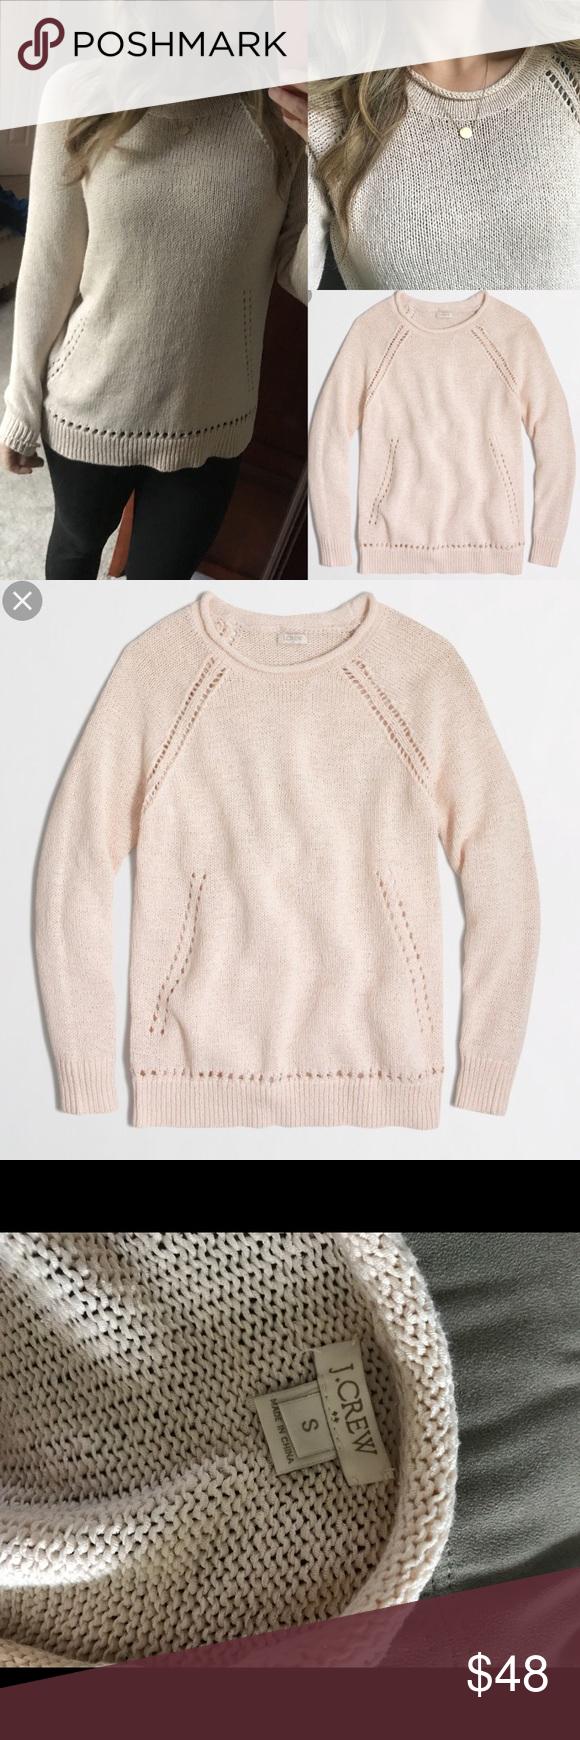 3e879cc34b Jcrew beach pointelle sweater sand s knit Jcrew factory beach sweater with pointelle  details in a pretty light sand pinkish tone. Worn a few times.